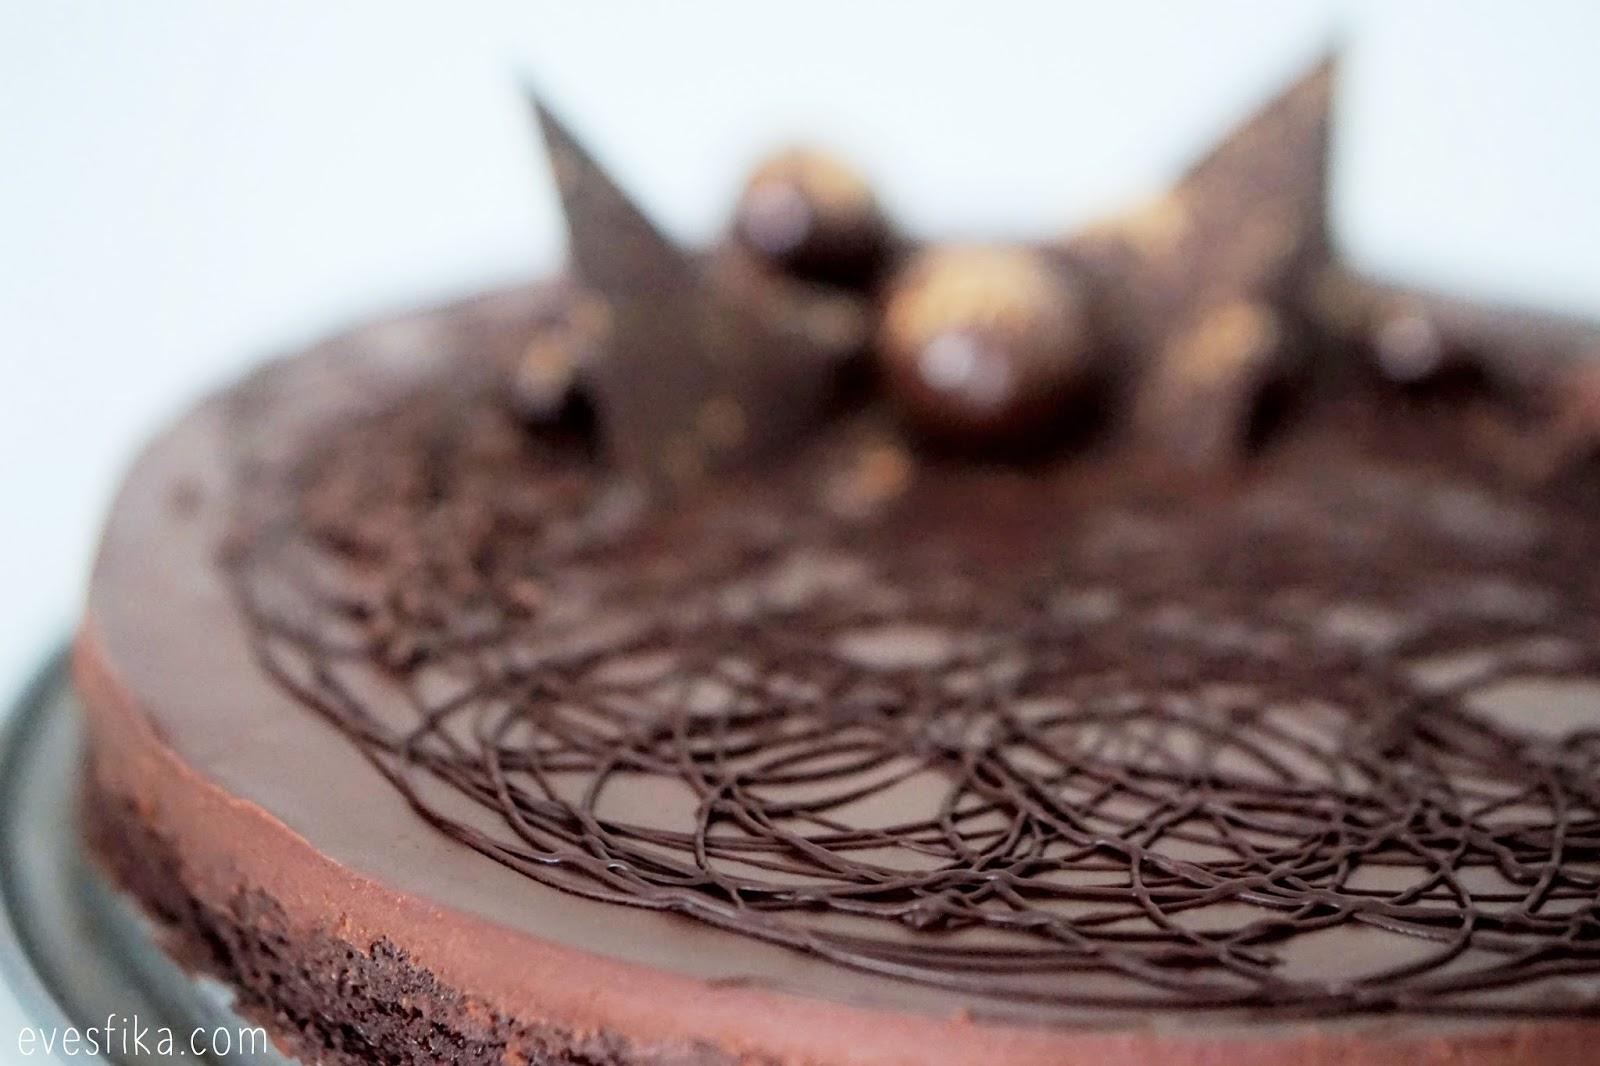 Eve S Fika Chocolate Tart With Cardamom And Baileys Cream Truffle